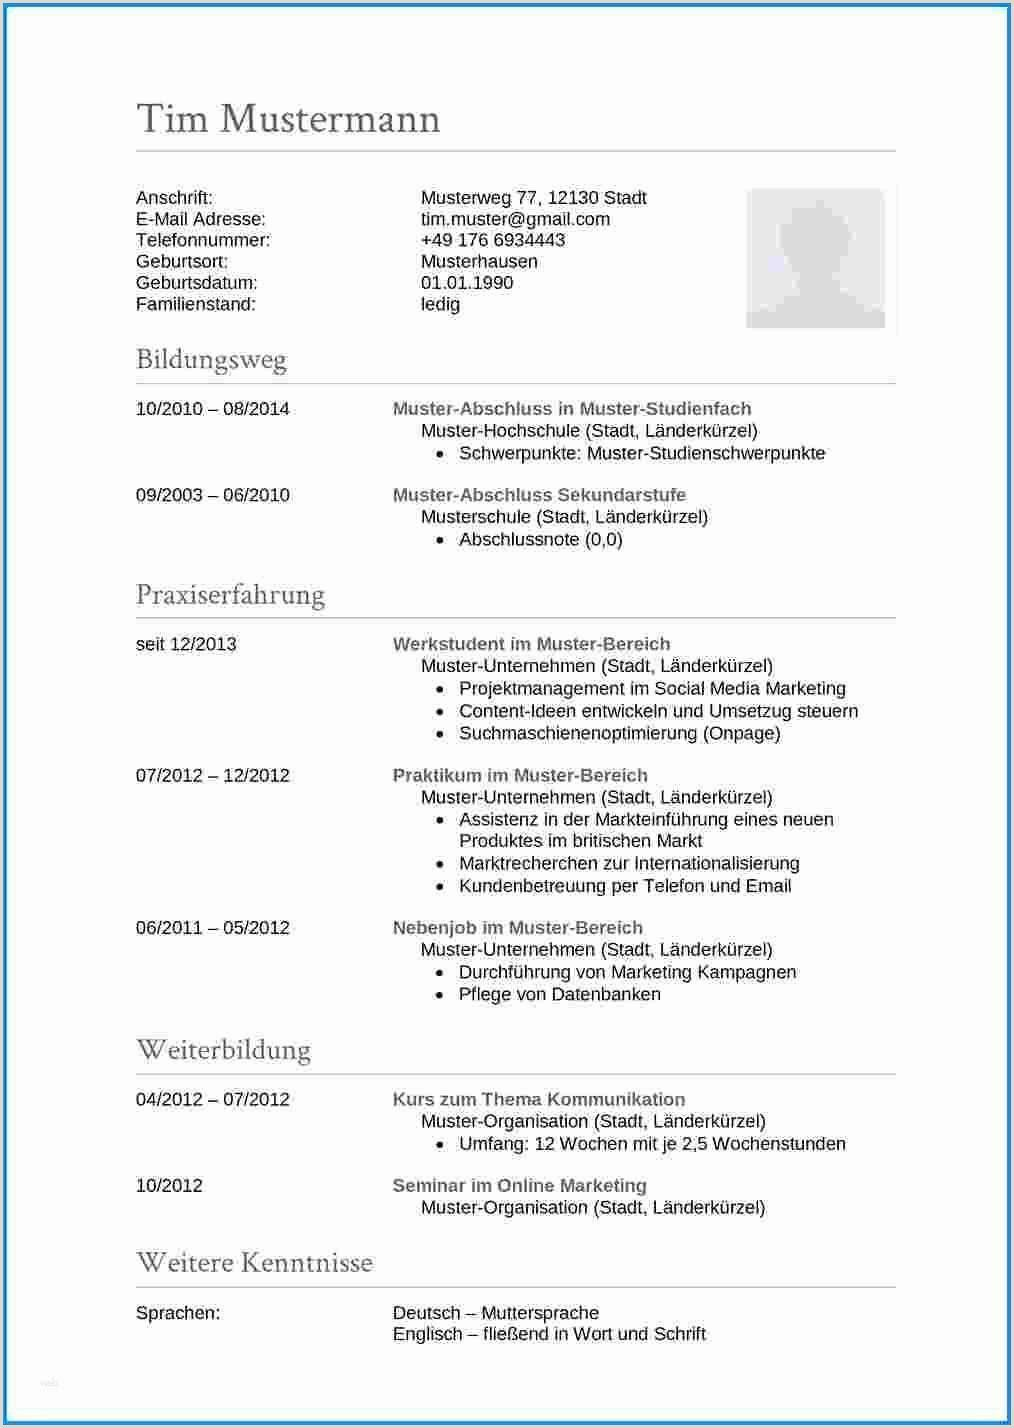 Lebenslauf Muster Akademiker Resume Template Free Downloadable Lebenslauf Muster Akademiker Lebenslauf Mu In 2020 Vorlagen Lebenslauf Lebenslauf Lebenslauf Muster